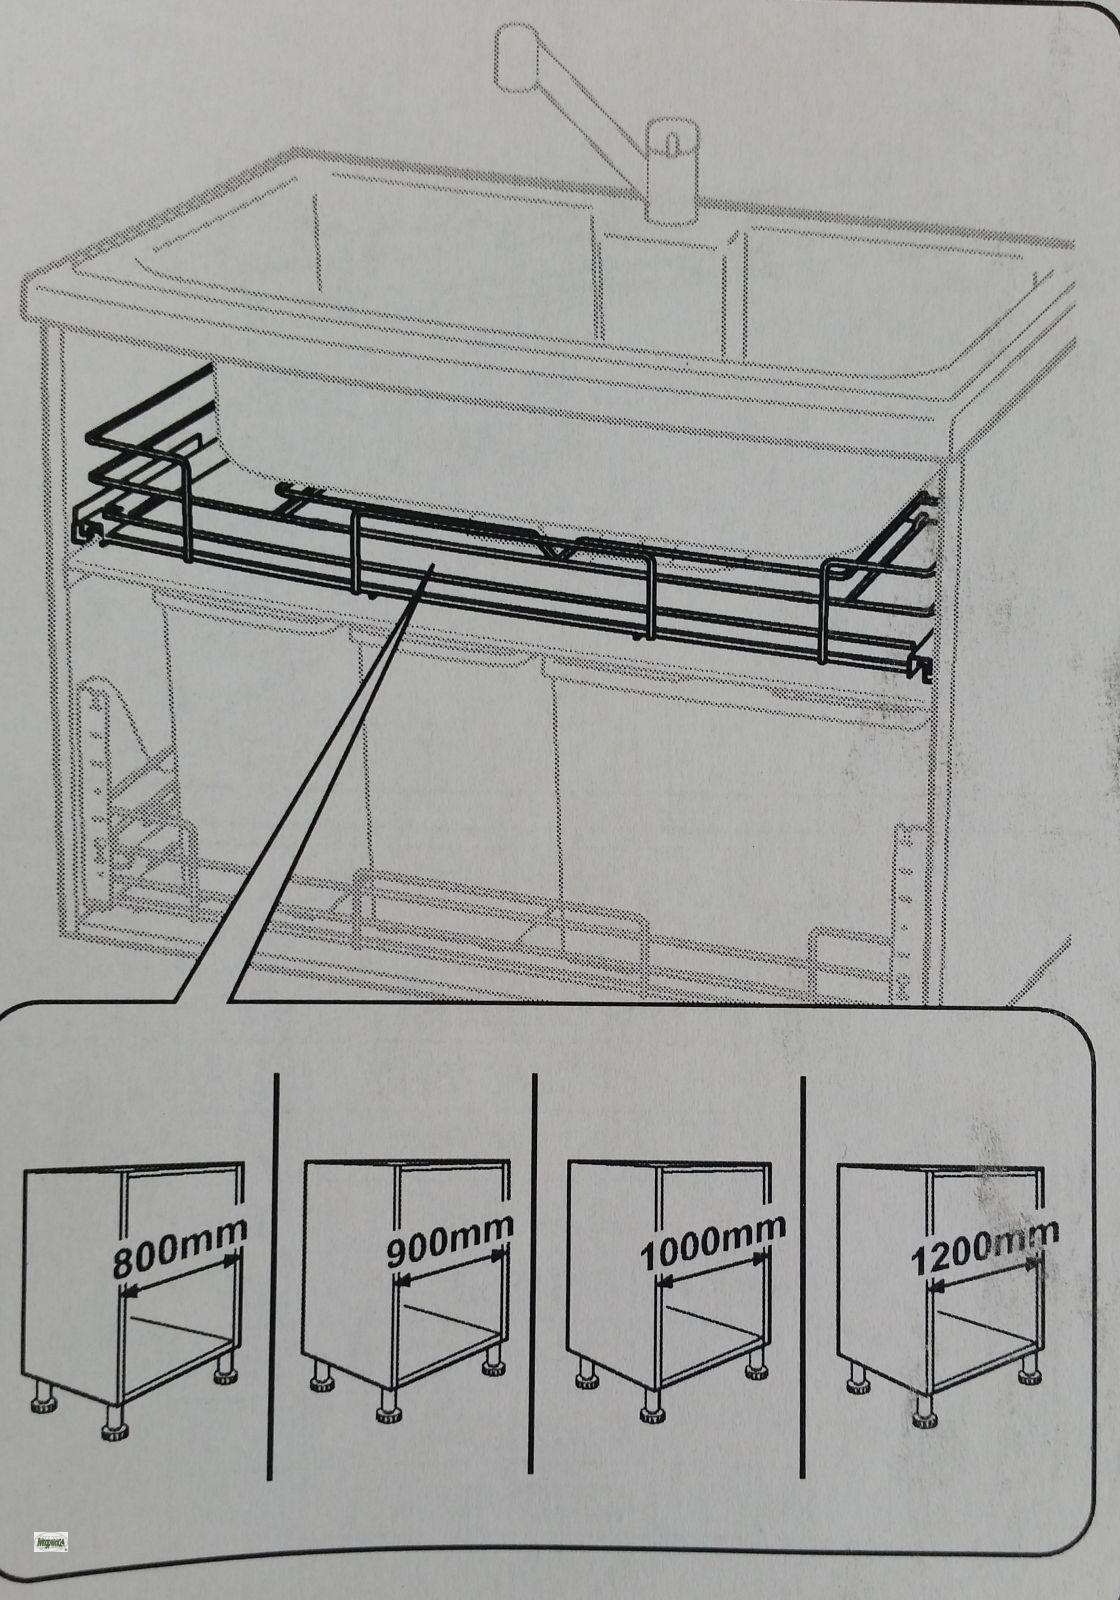 k chenauszug f r 80cm sp lenunterschrank schrankauszug sifonausschnitt 485 19 ebay. Black Bedroom Furniture Sets. Home Design Ideas